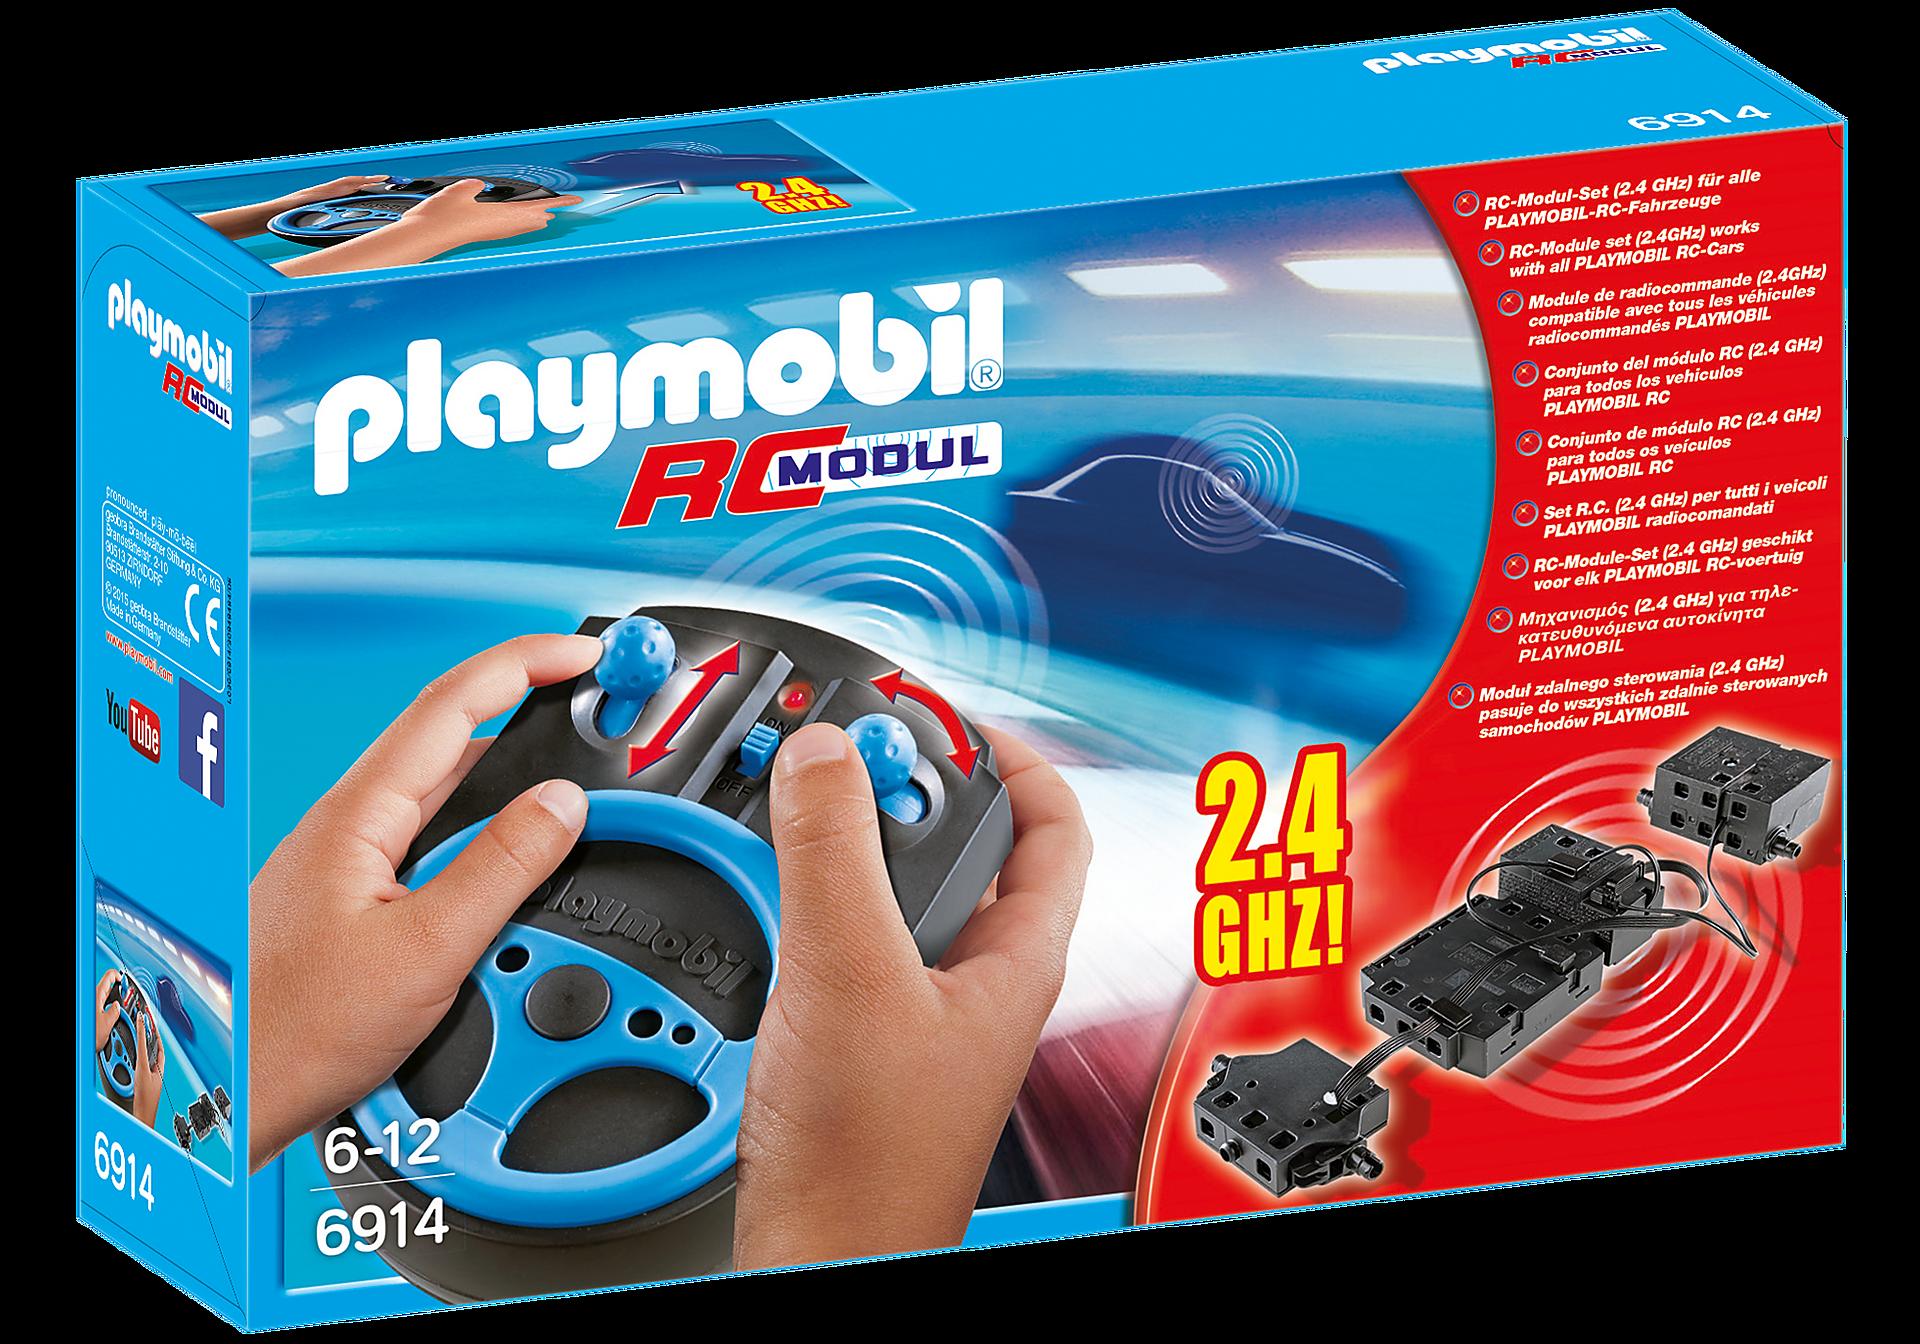 http://media.playmobil.com/i/playmobil/6914_product_box_front/RC Moduł Plus Set